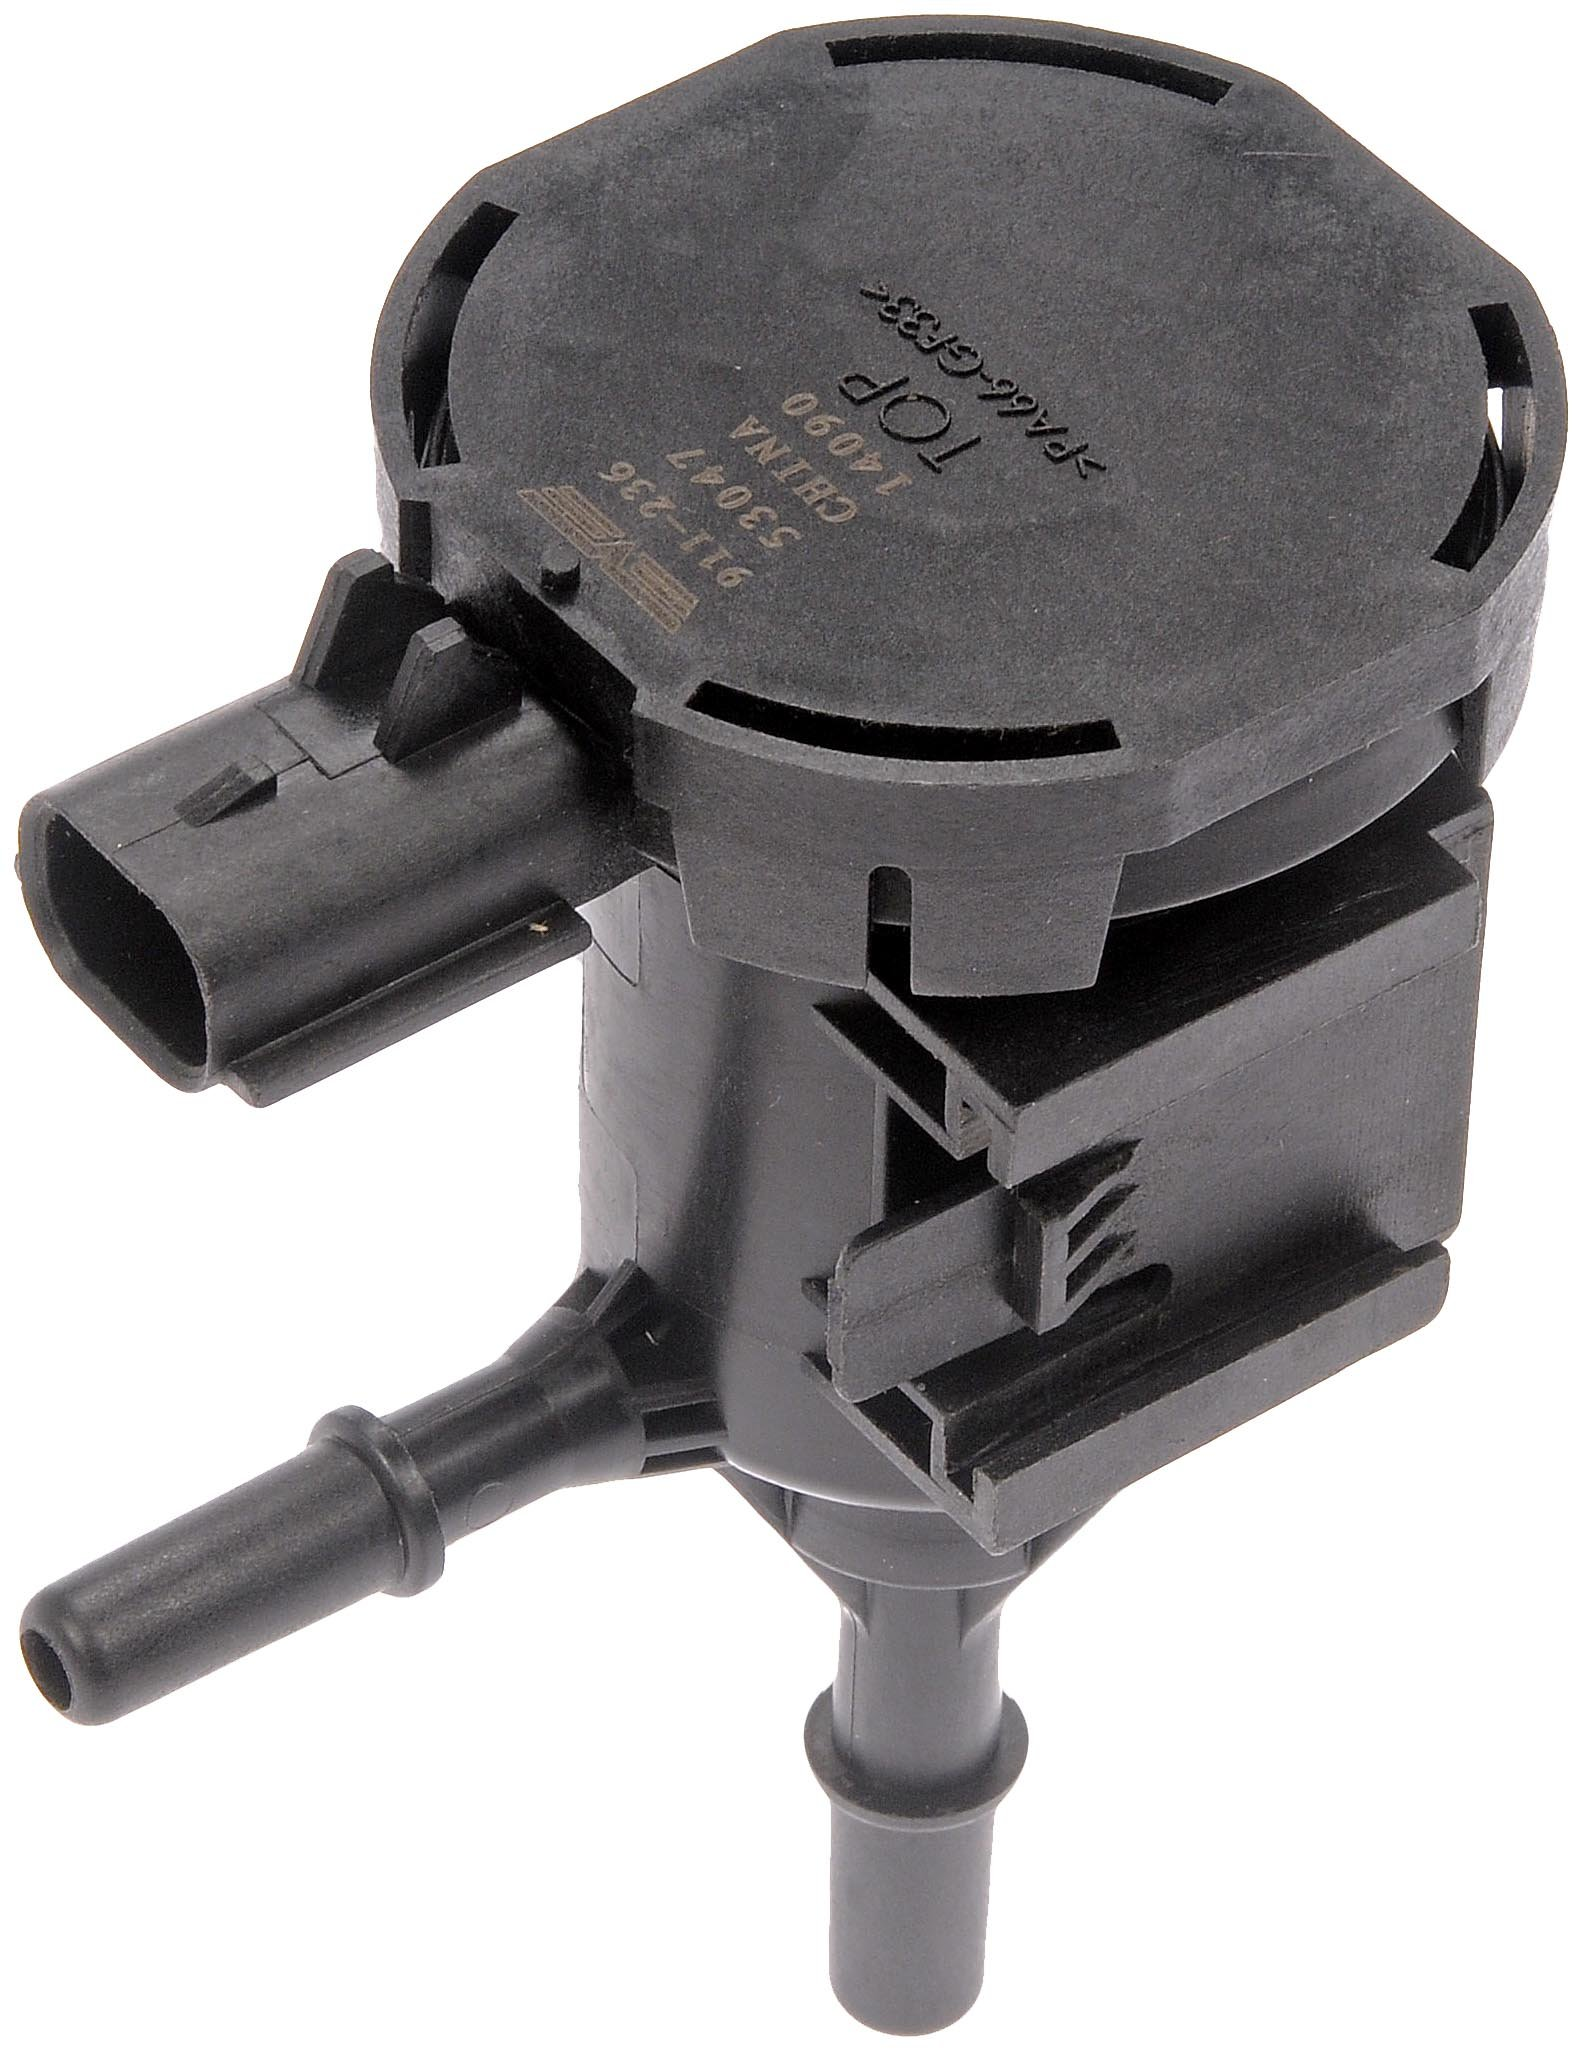 Dorman 911-236 Vapor Canister Purge Valve